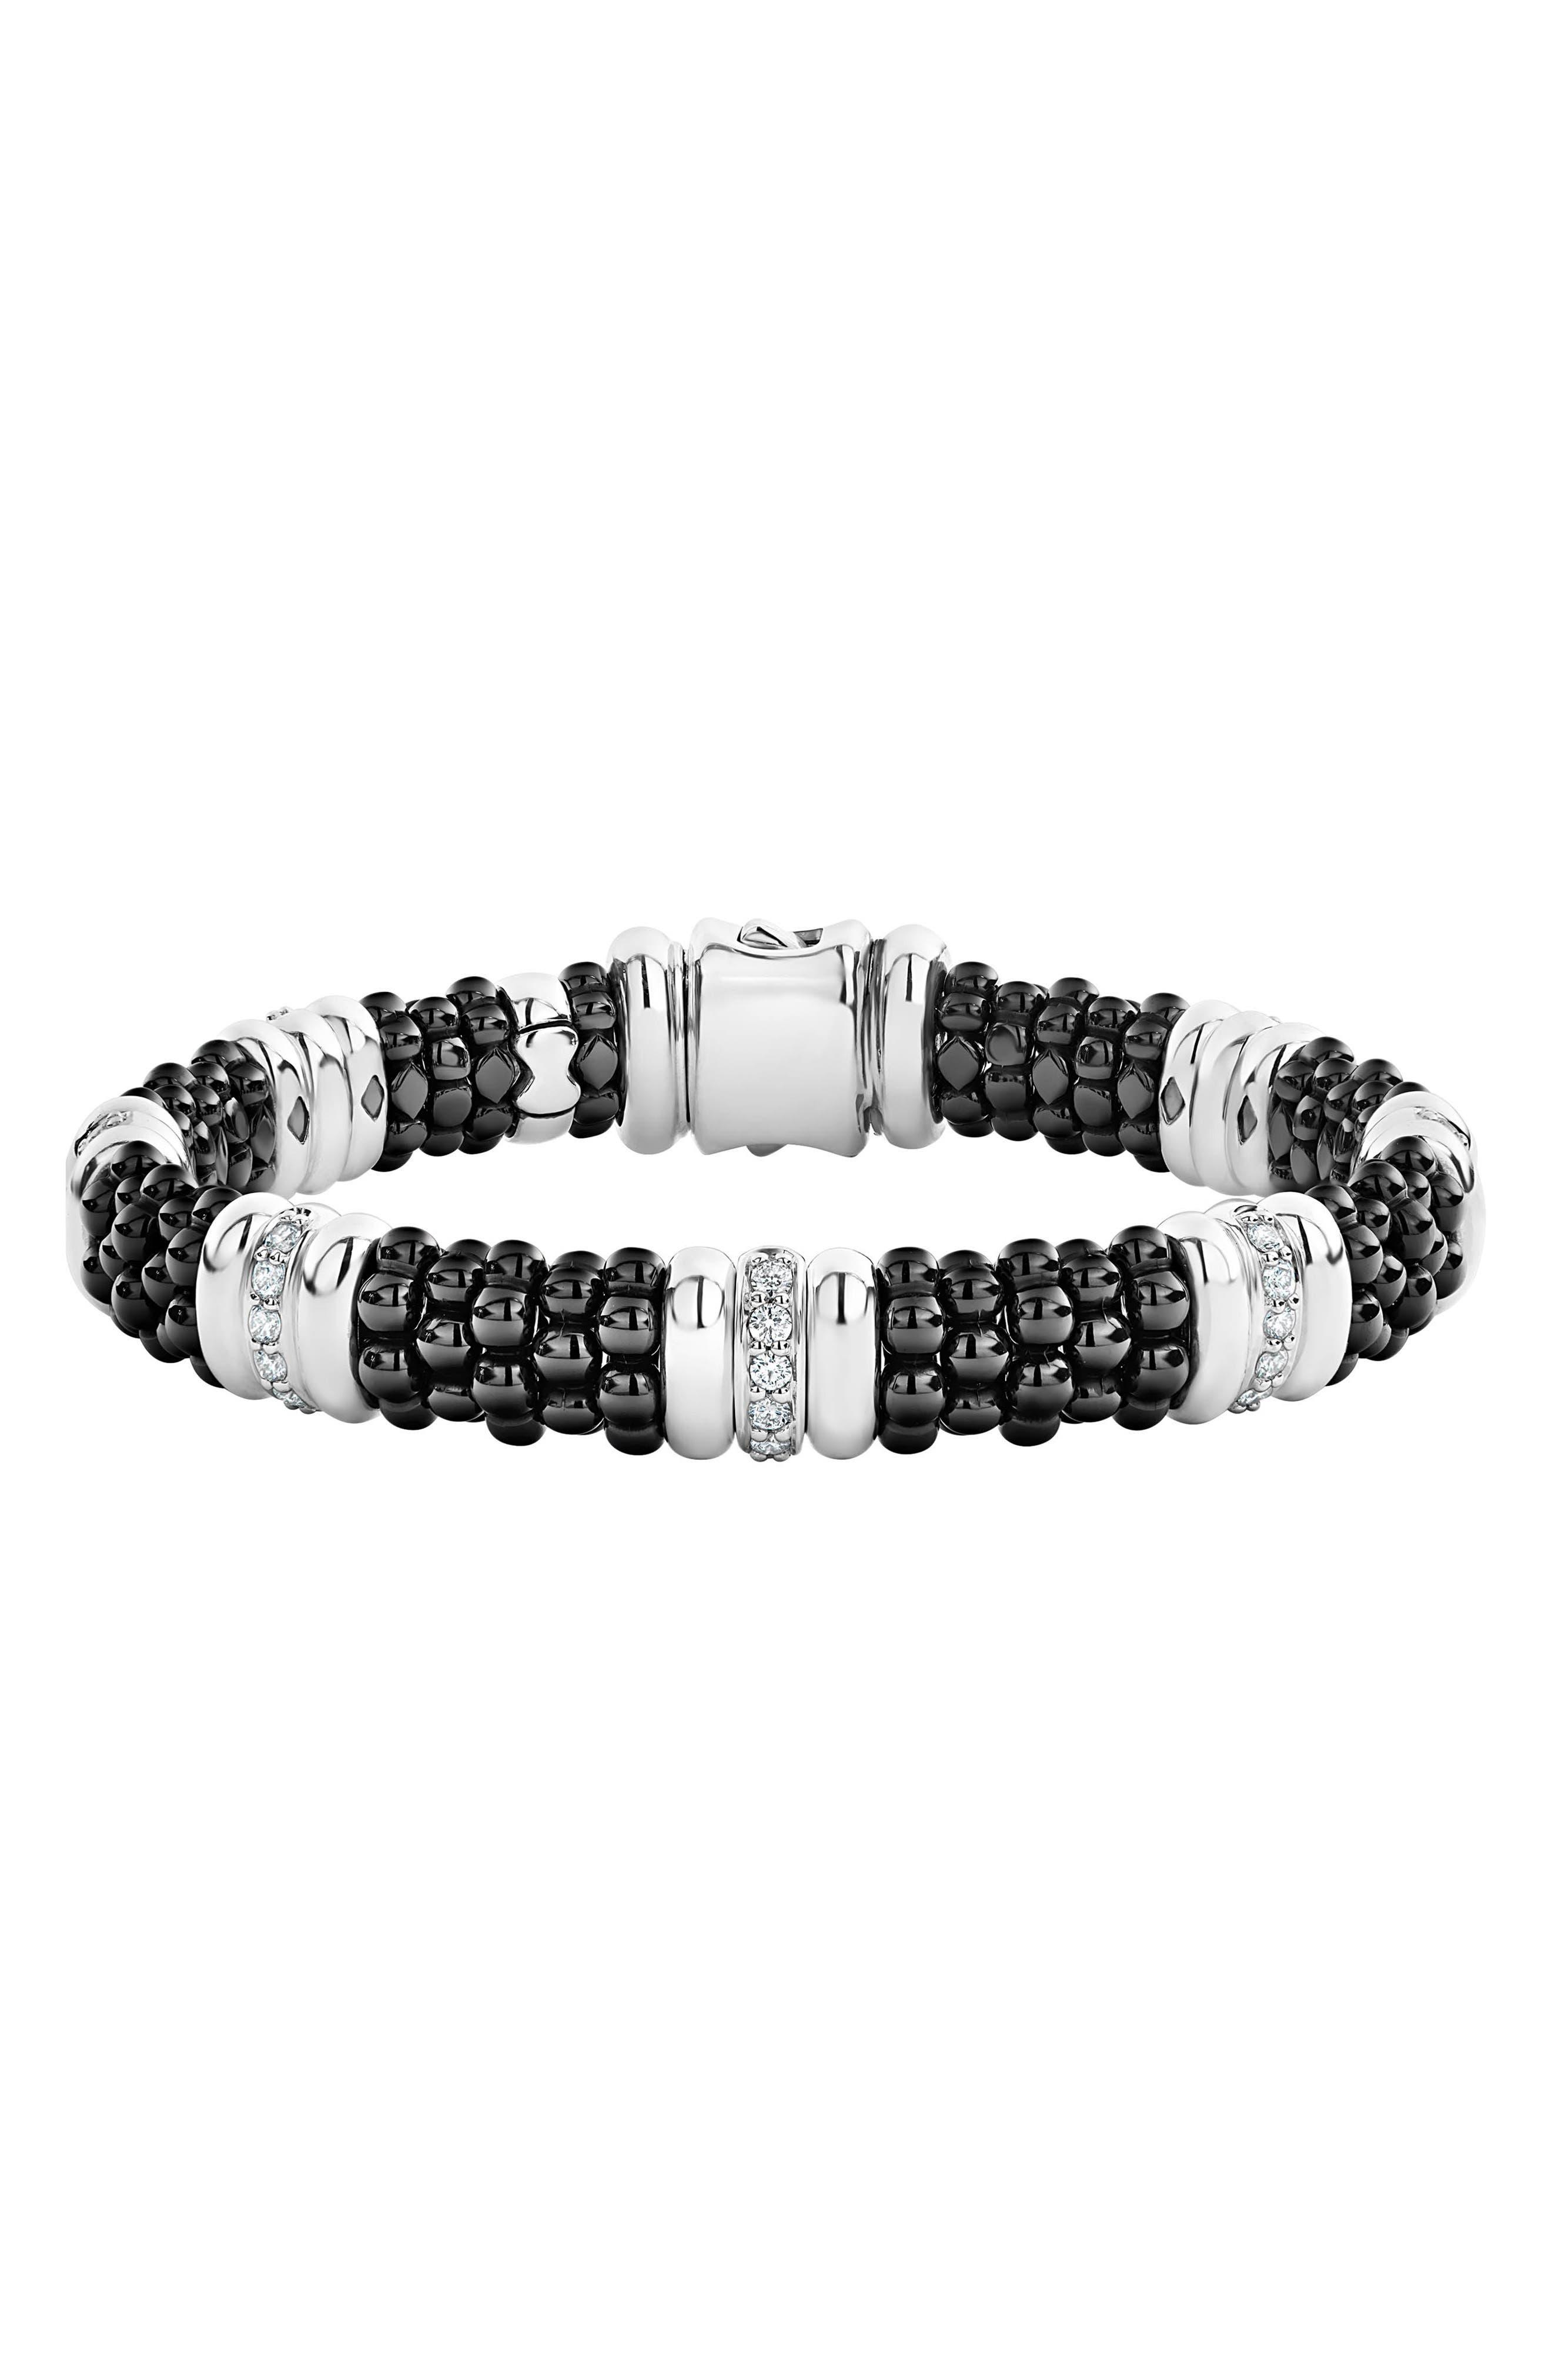 LAOGS Black Caviar Diamond 7-Link Bracelet,                             Main thumbnail 1, color,                             SILVER